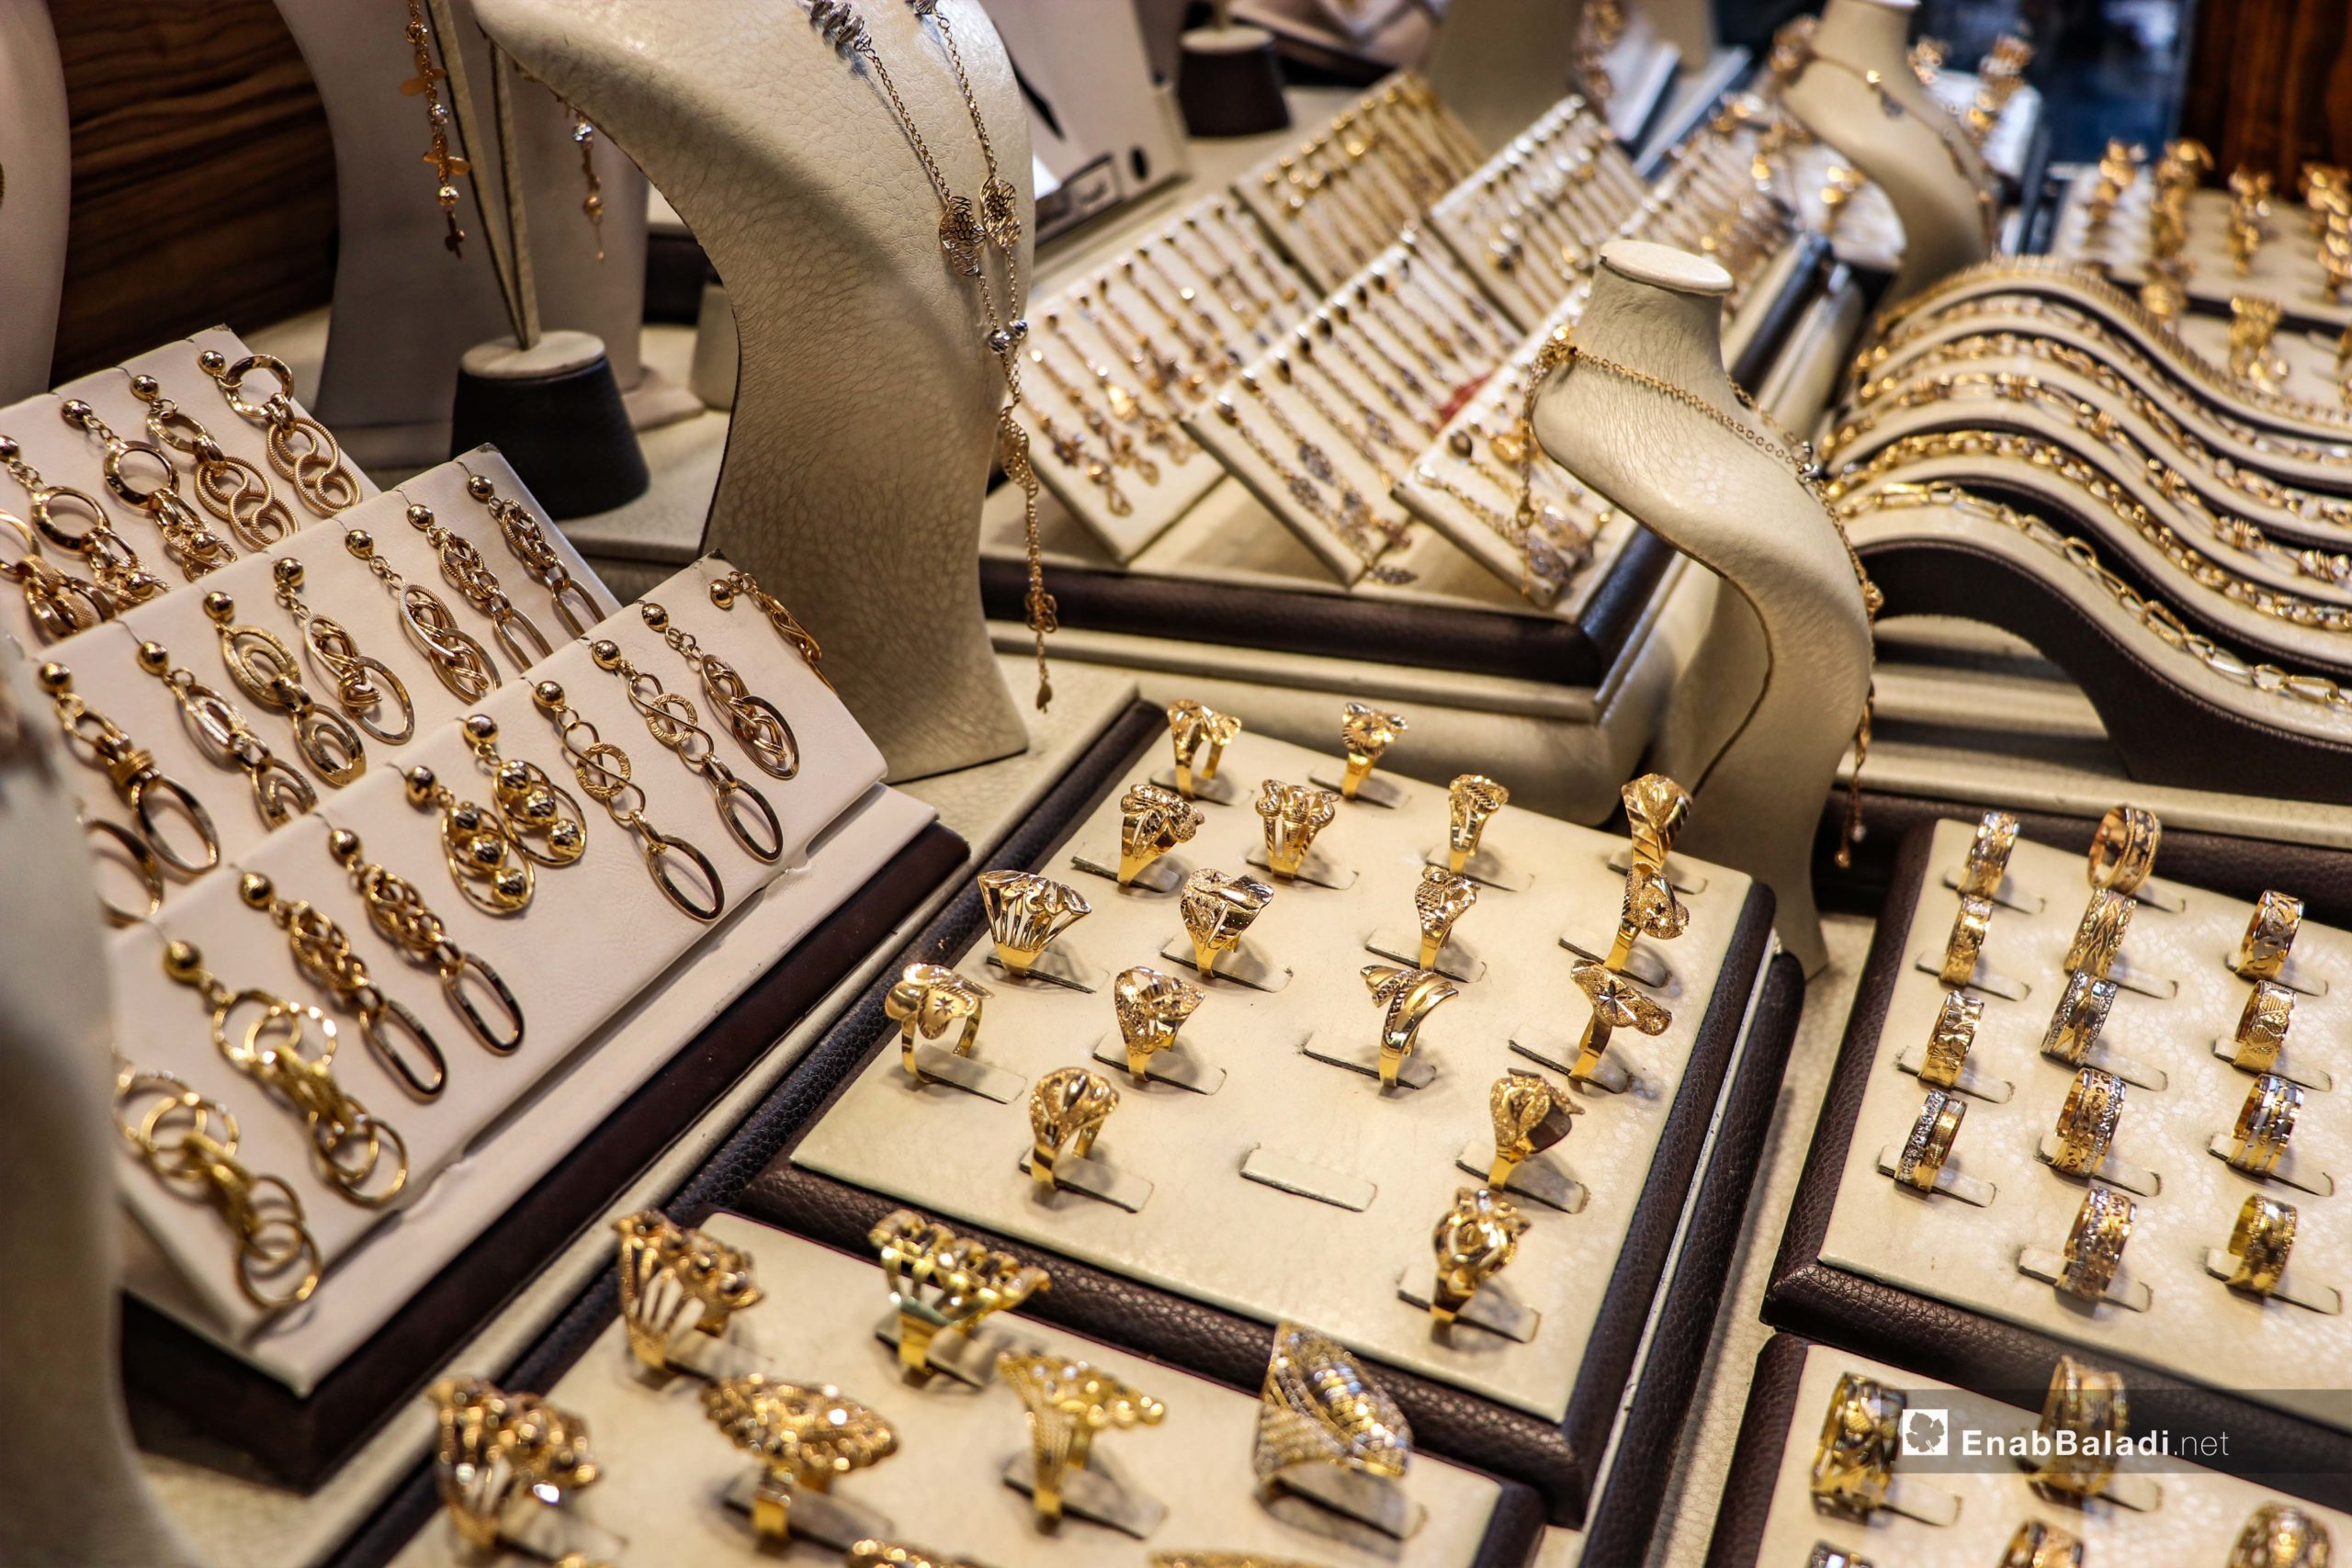 Gold jewellery and money exchange shops in al-Bab city in northern Aleppo countryside – 04 June 2020 (Enab Baladi – Asim Melhem)